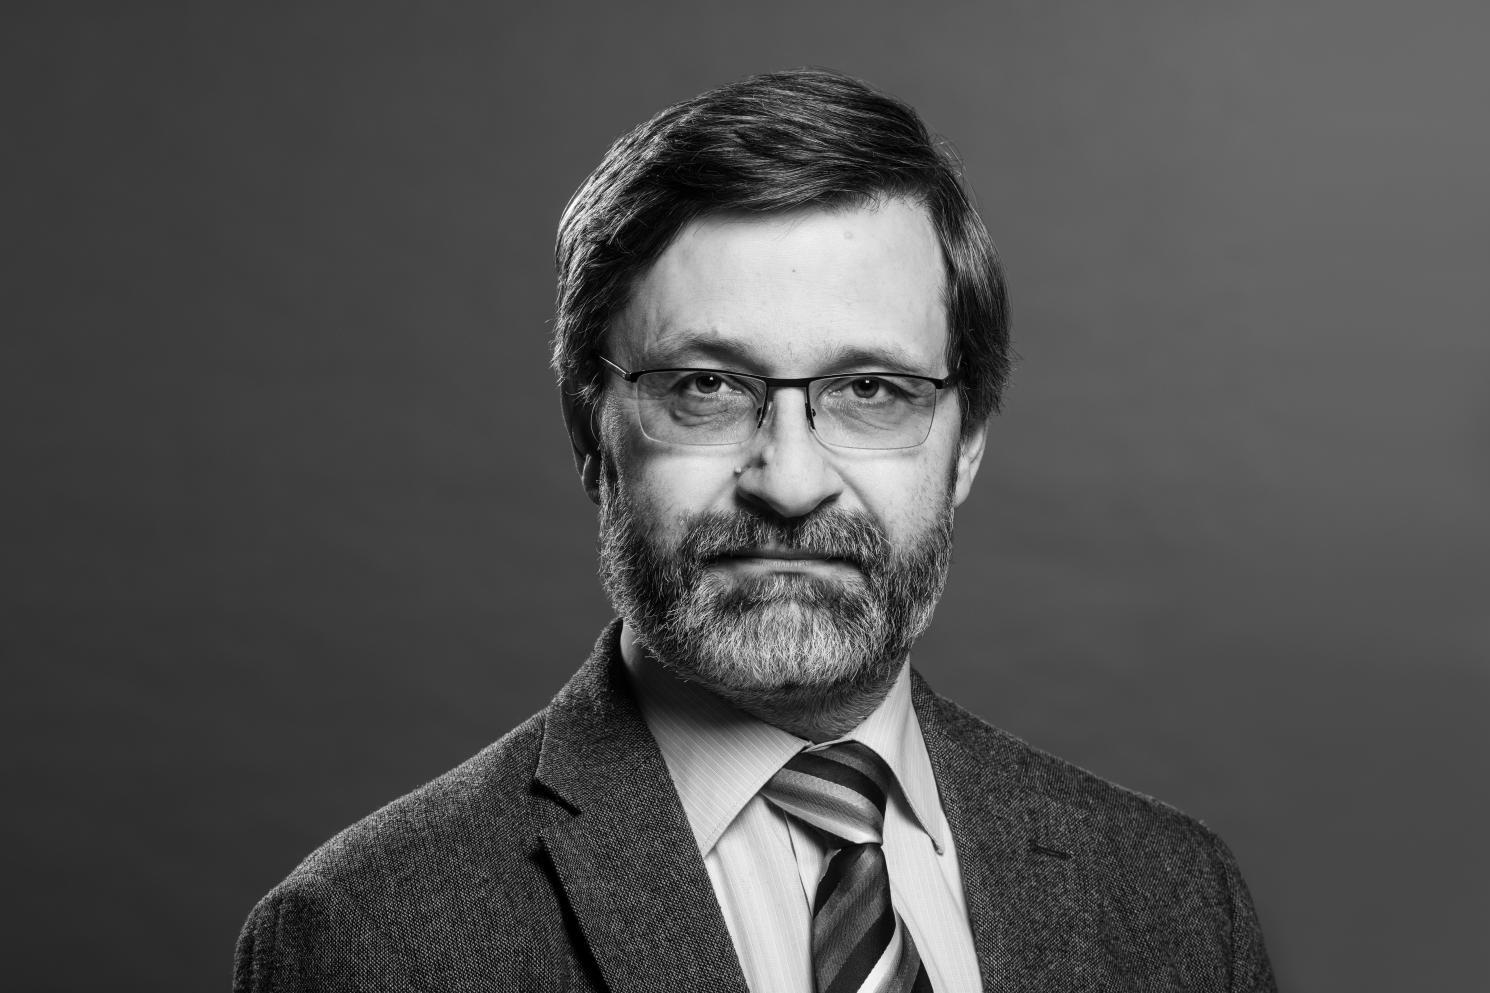 Ladislav Štefanec